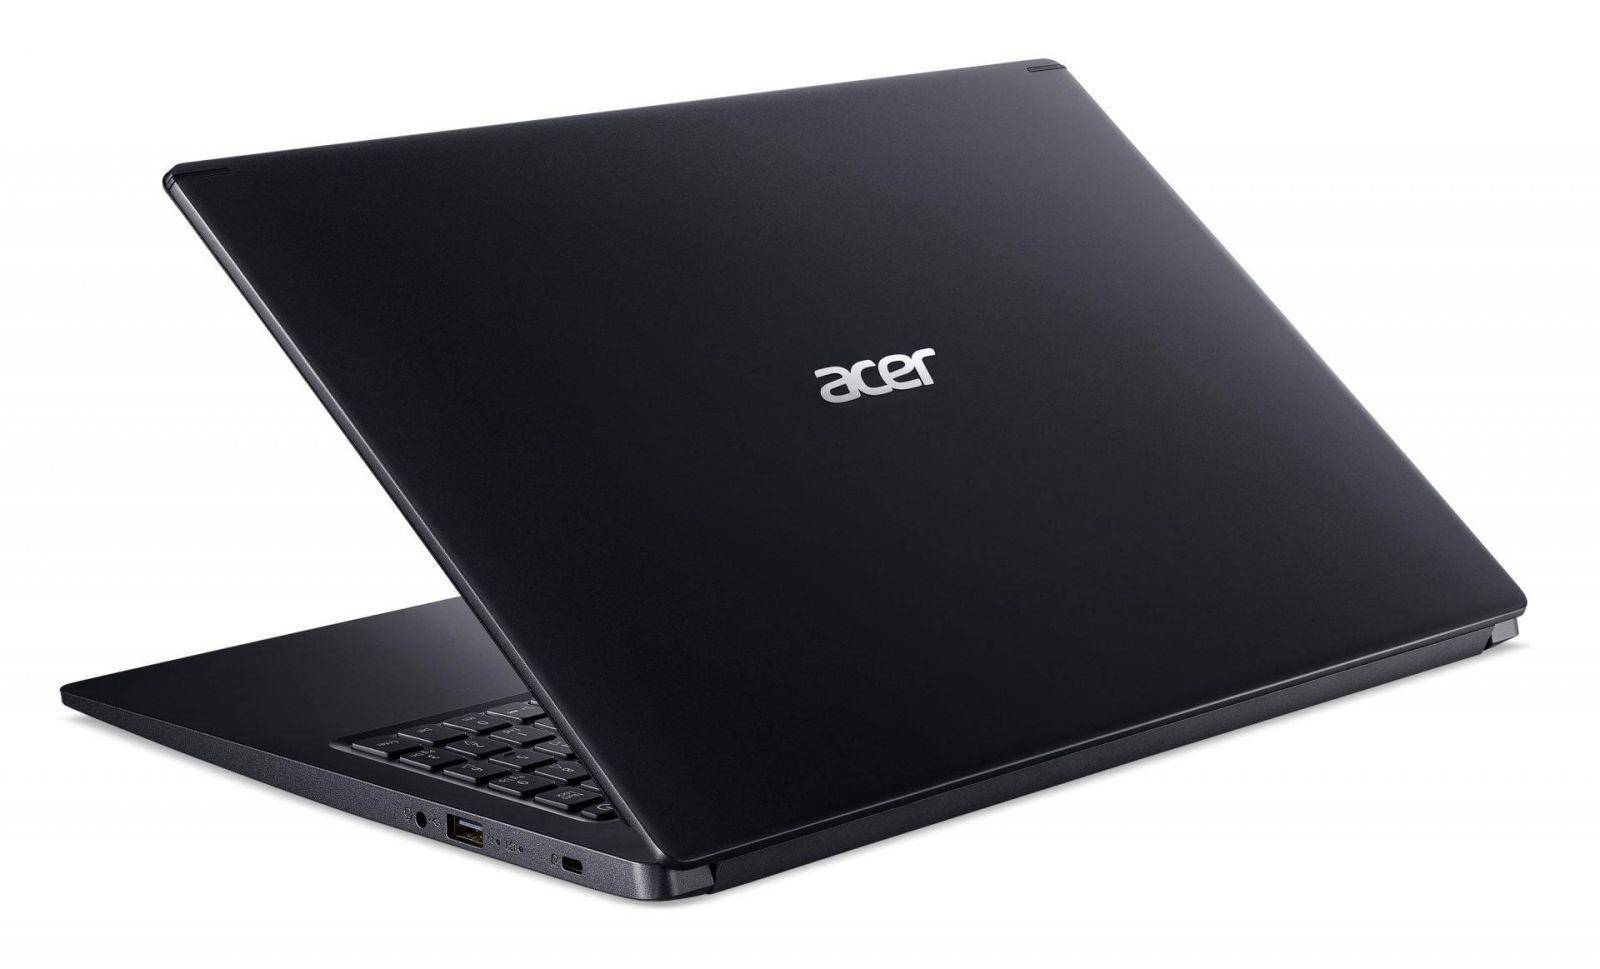 Acer представила новую линейку ноутбуков Aspire (aspire 5 01)